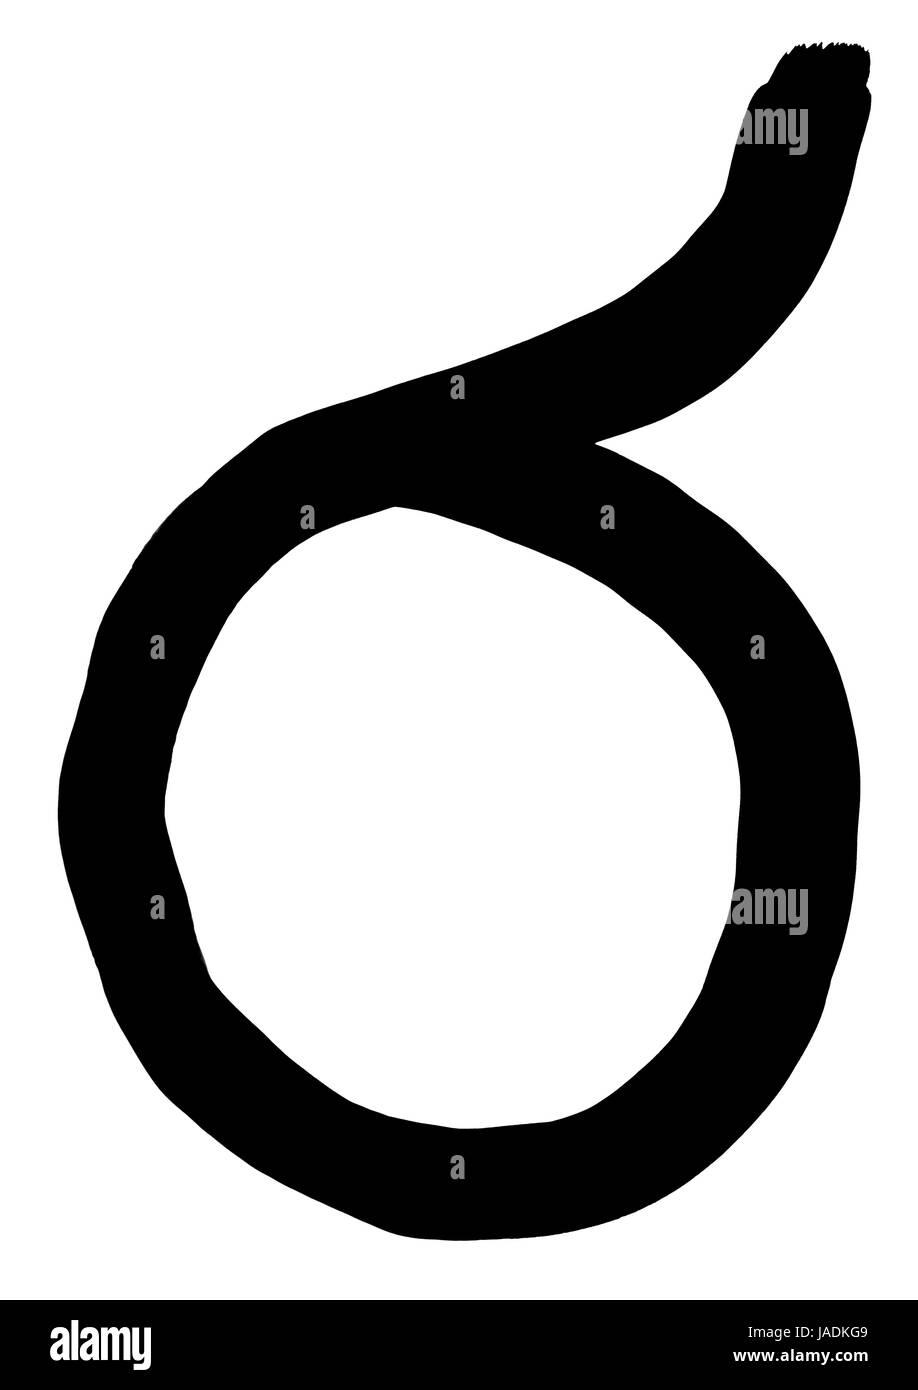 greek letter sigma hand written in black ink on white background